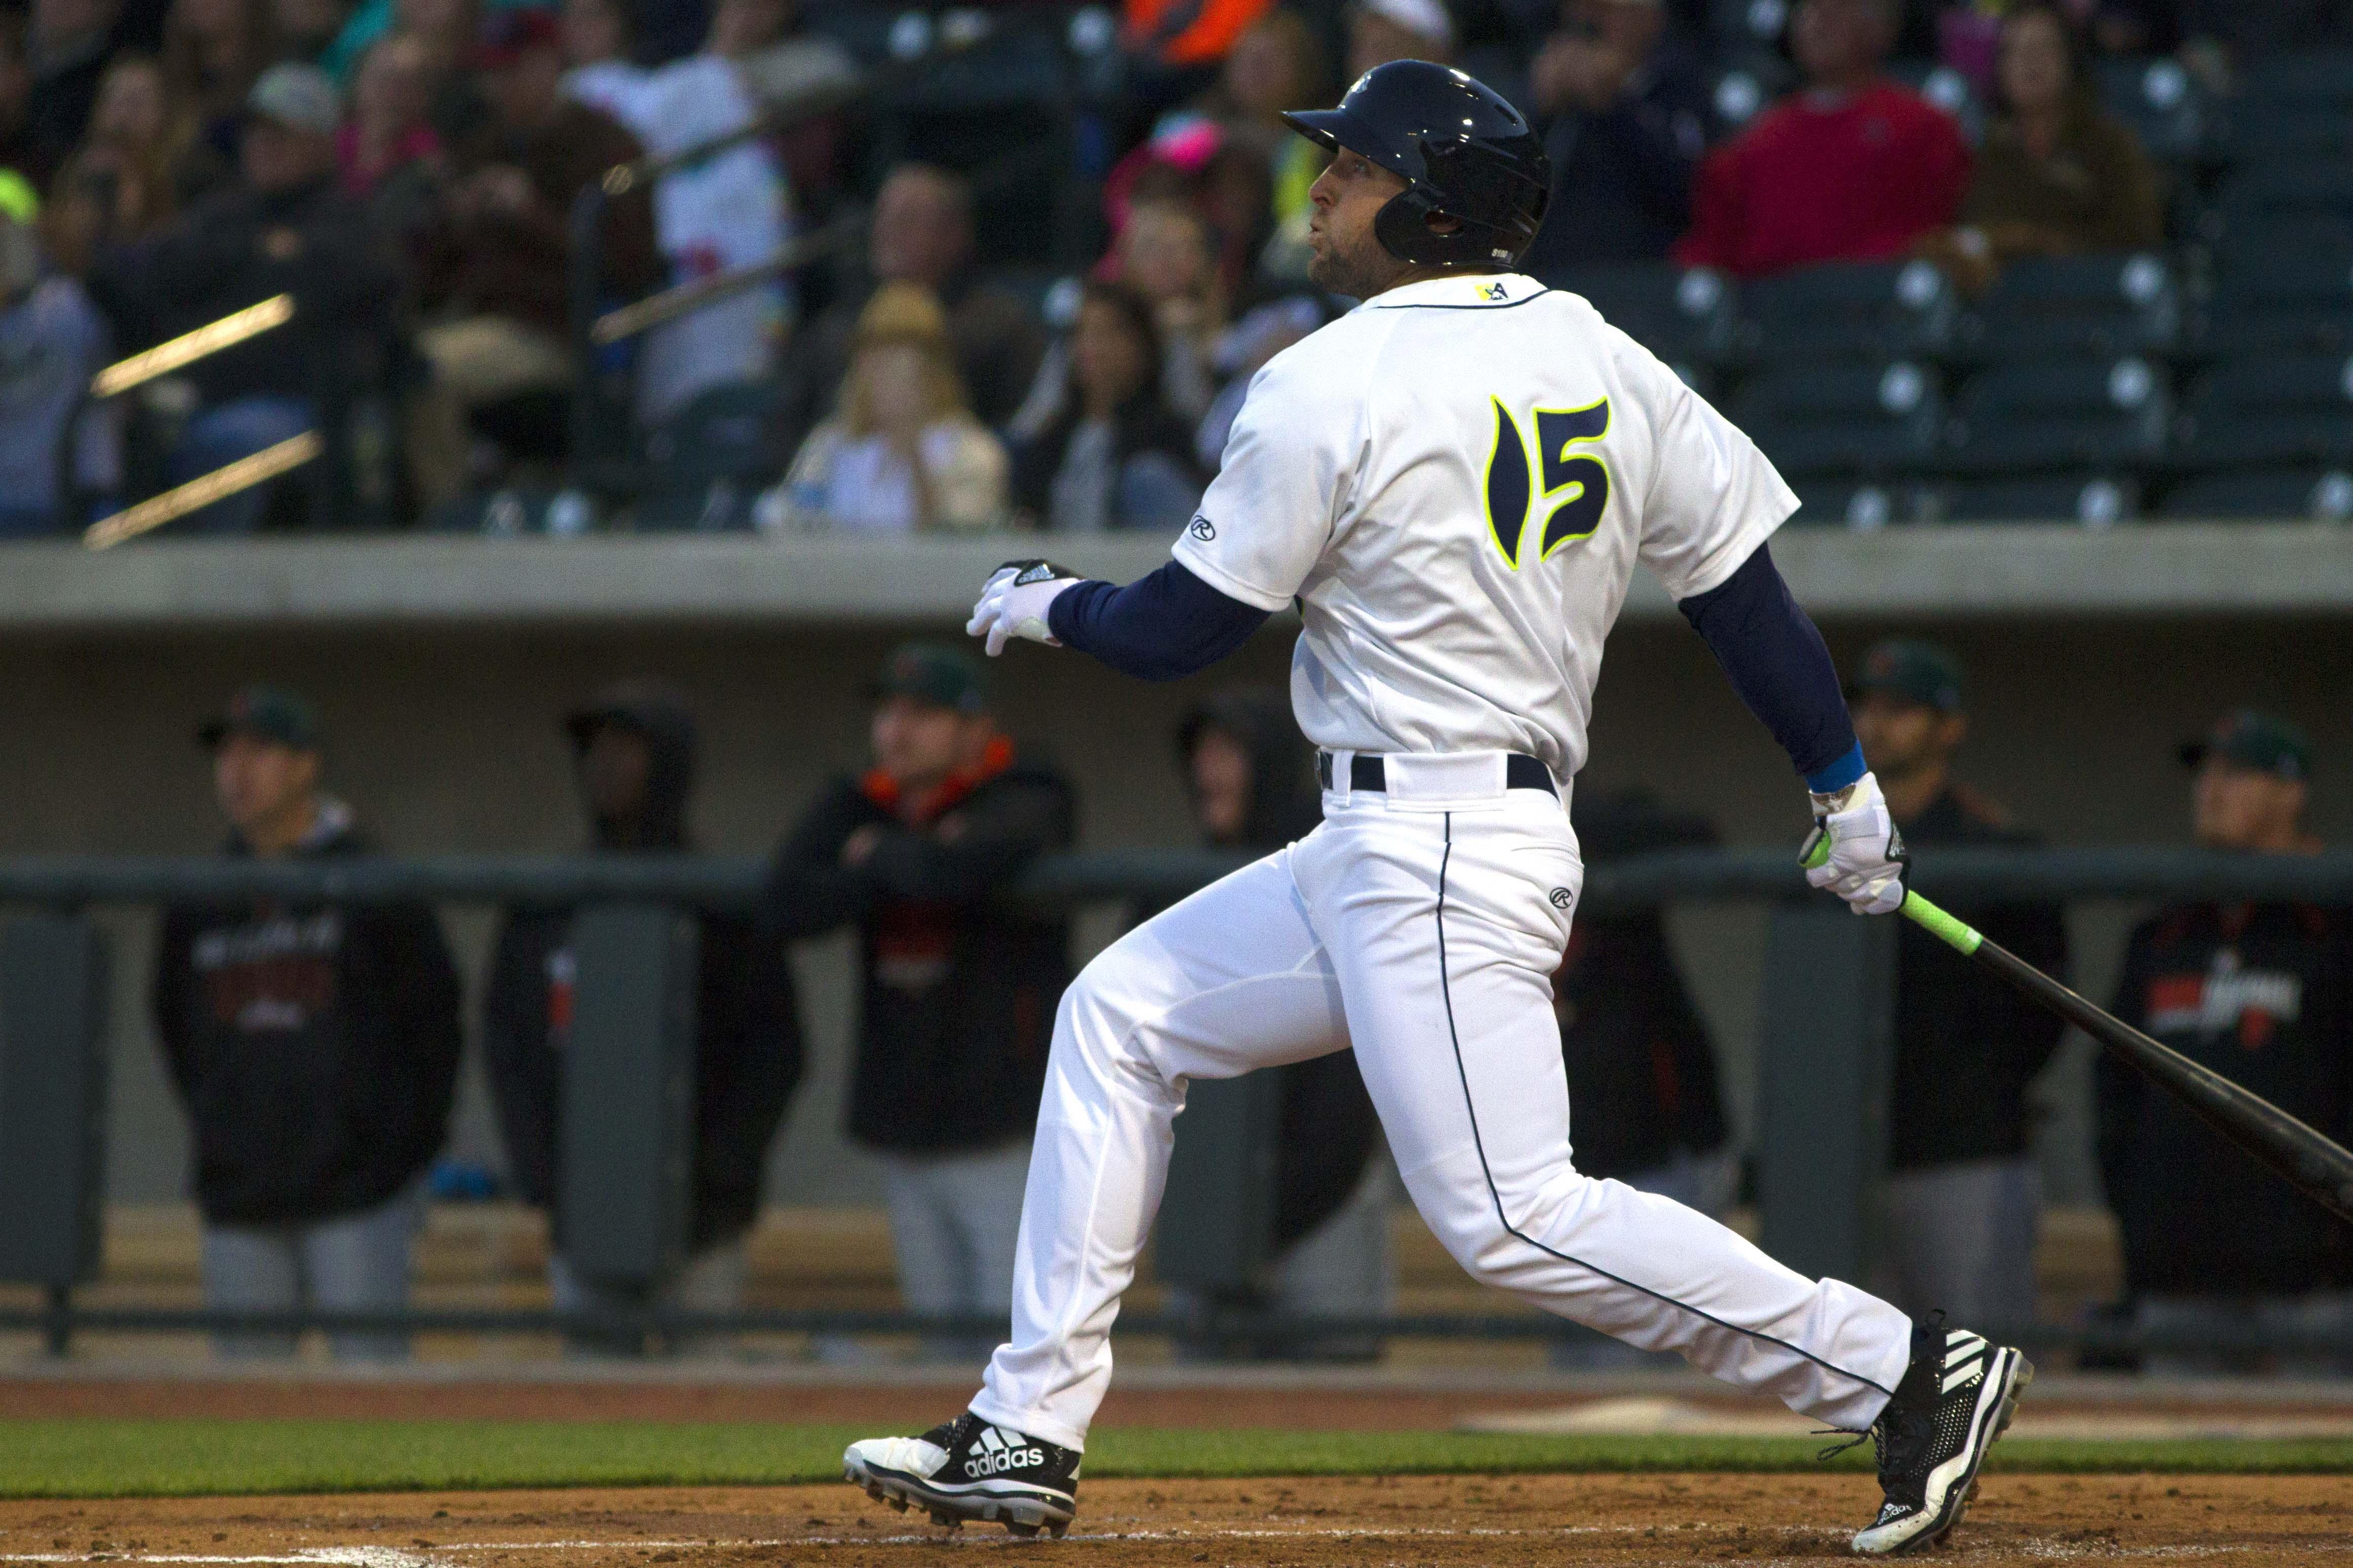 9997128-minor-league-baseball-augusta-greenjackets-at-columbia-fireflies